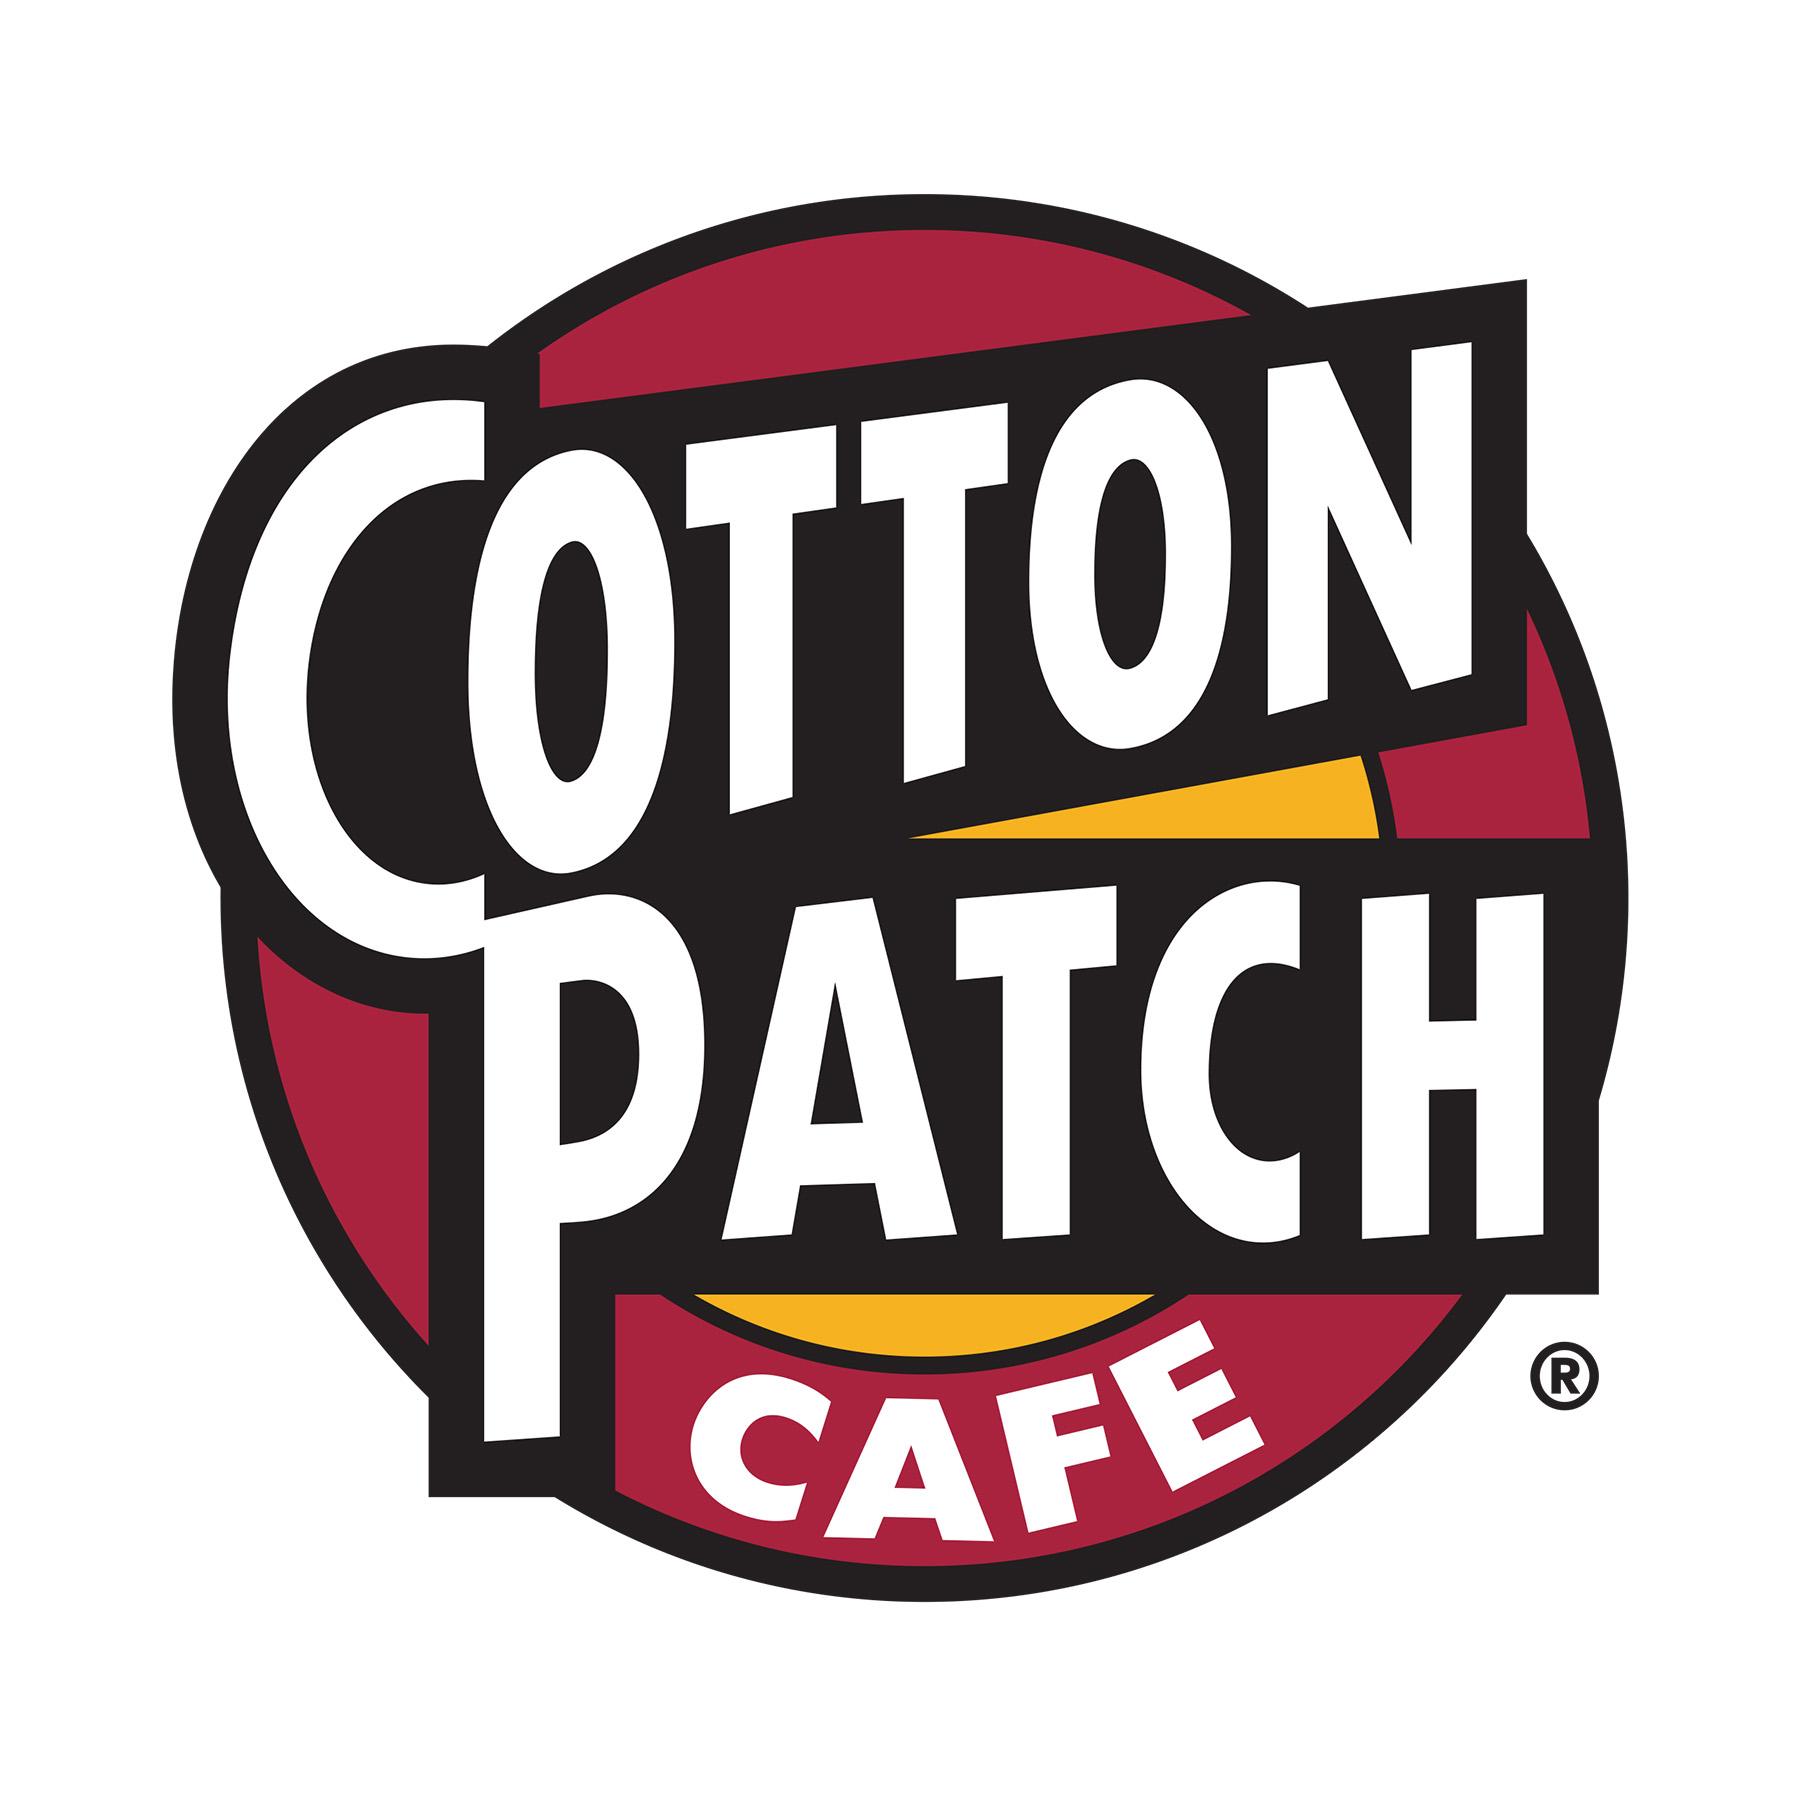 Cotton Patch Cafe.jpg